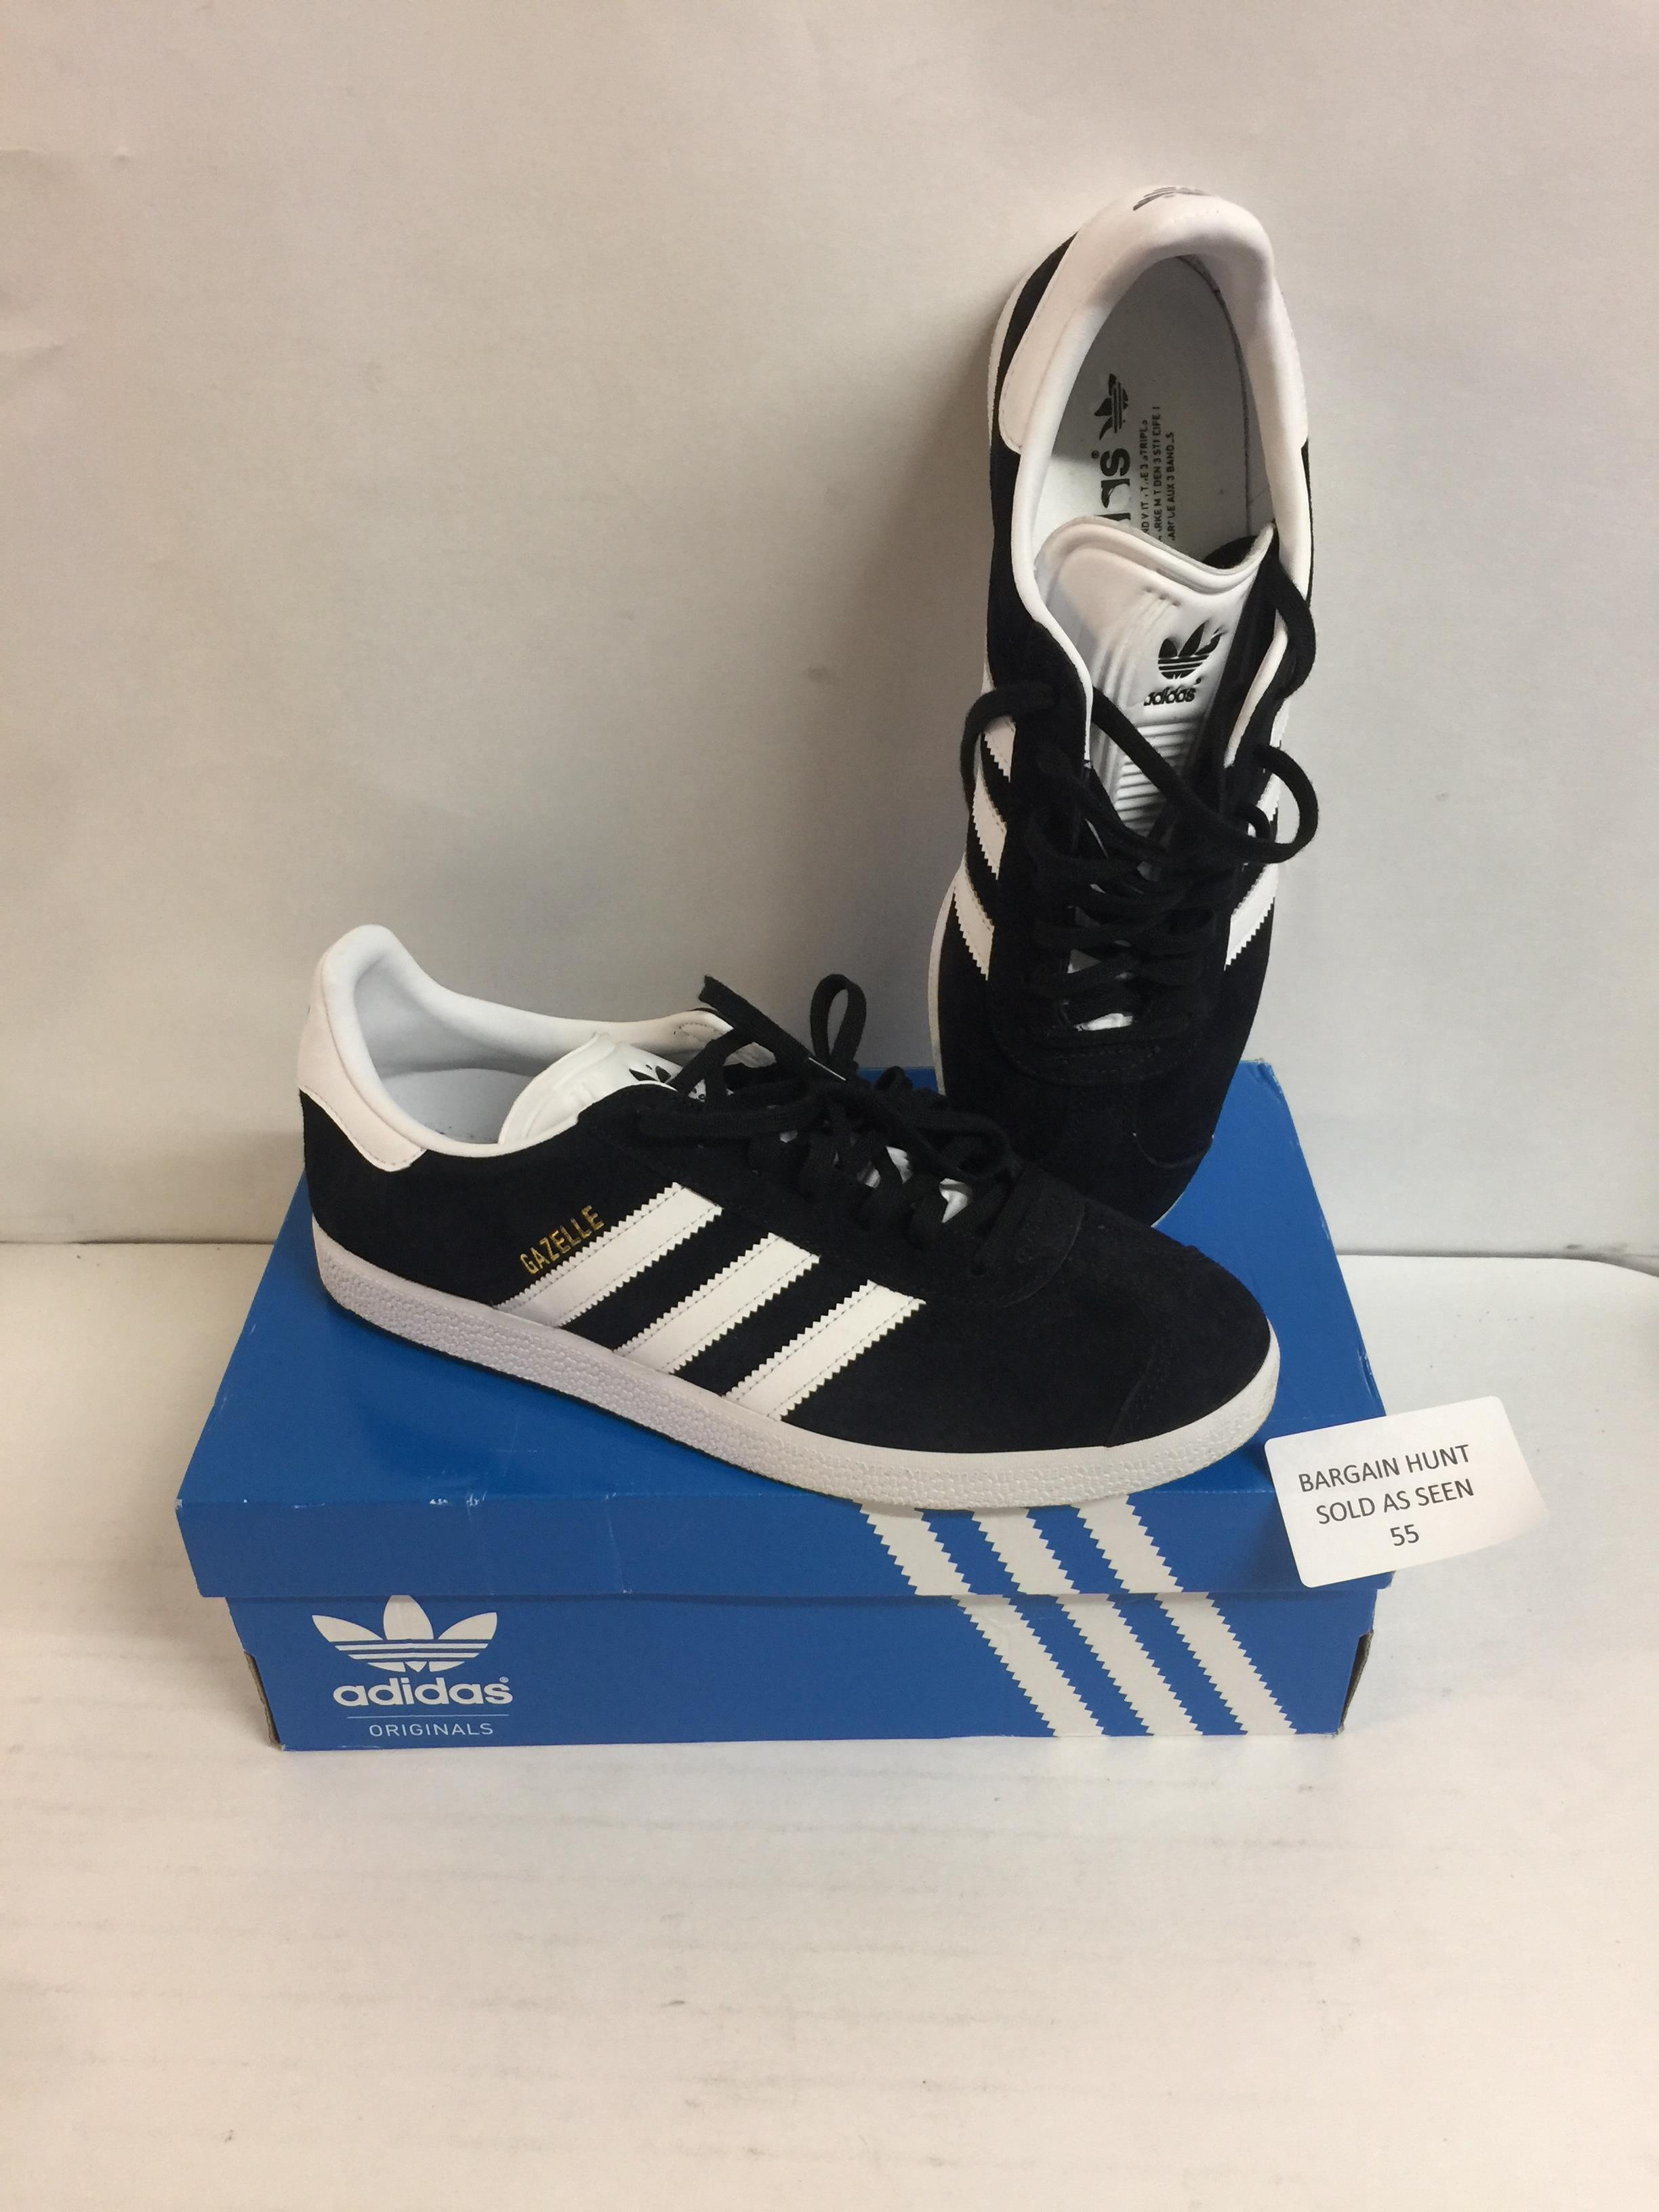 Lot 55 - Adidas Men's Gazelle Multisport Outdoor Shoes, 8 UK